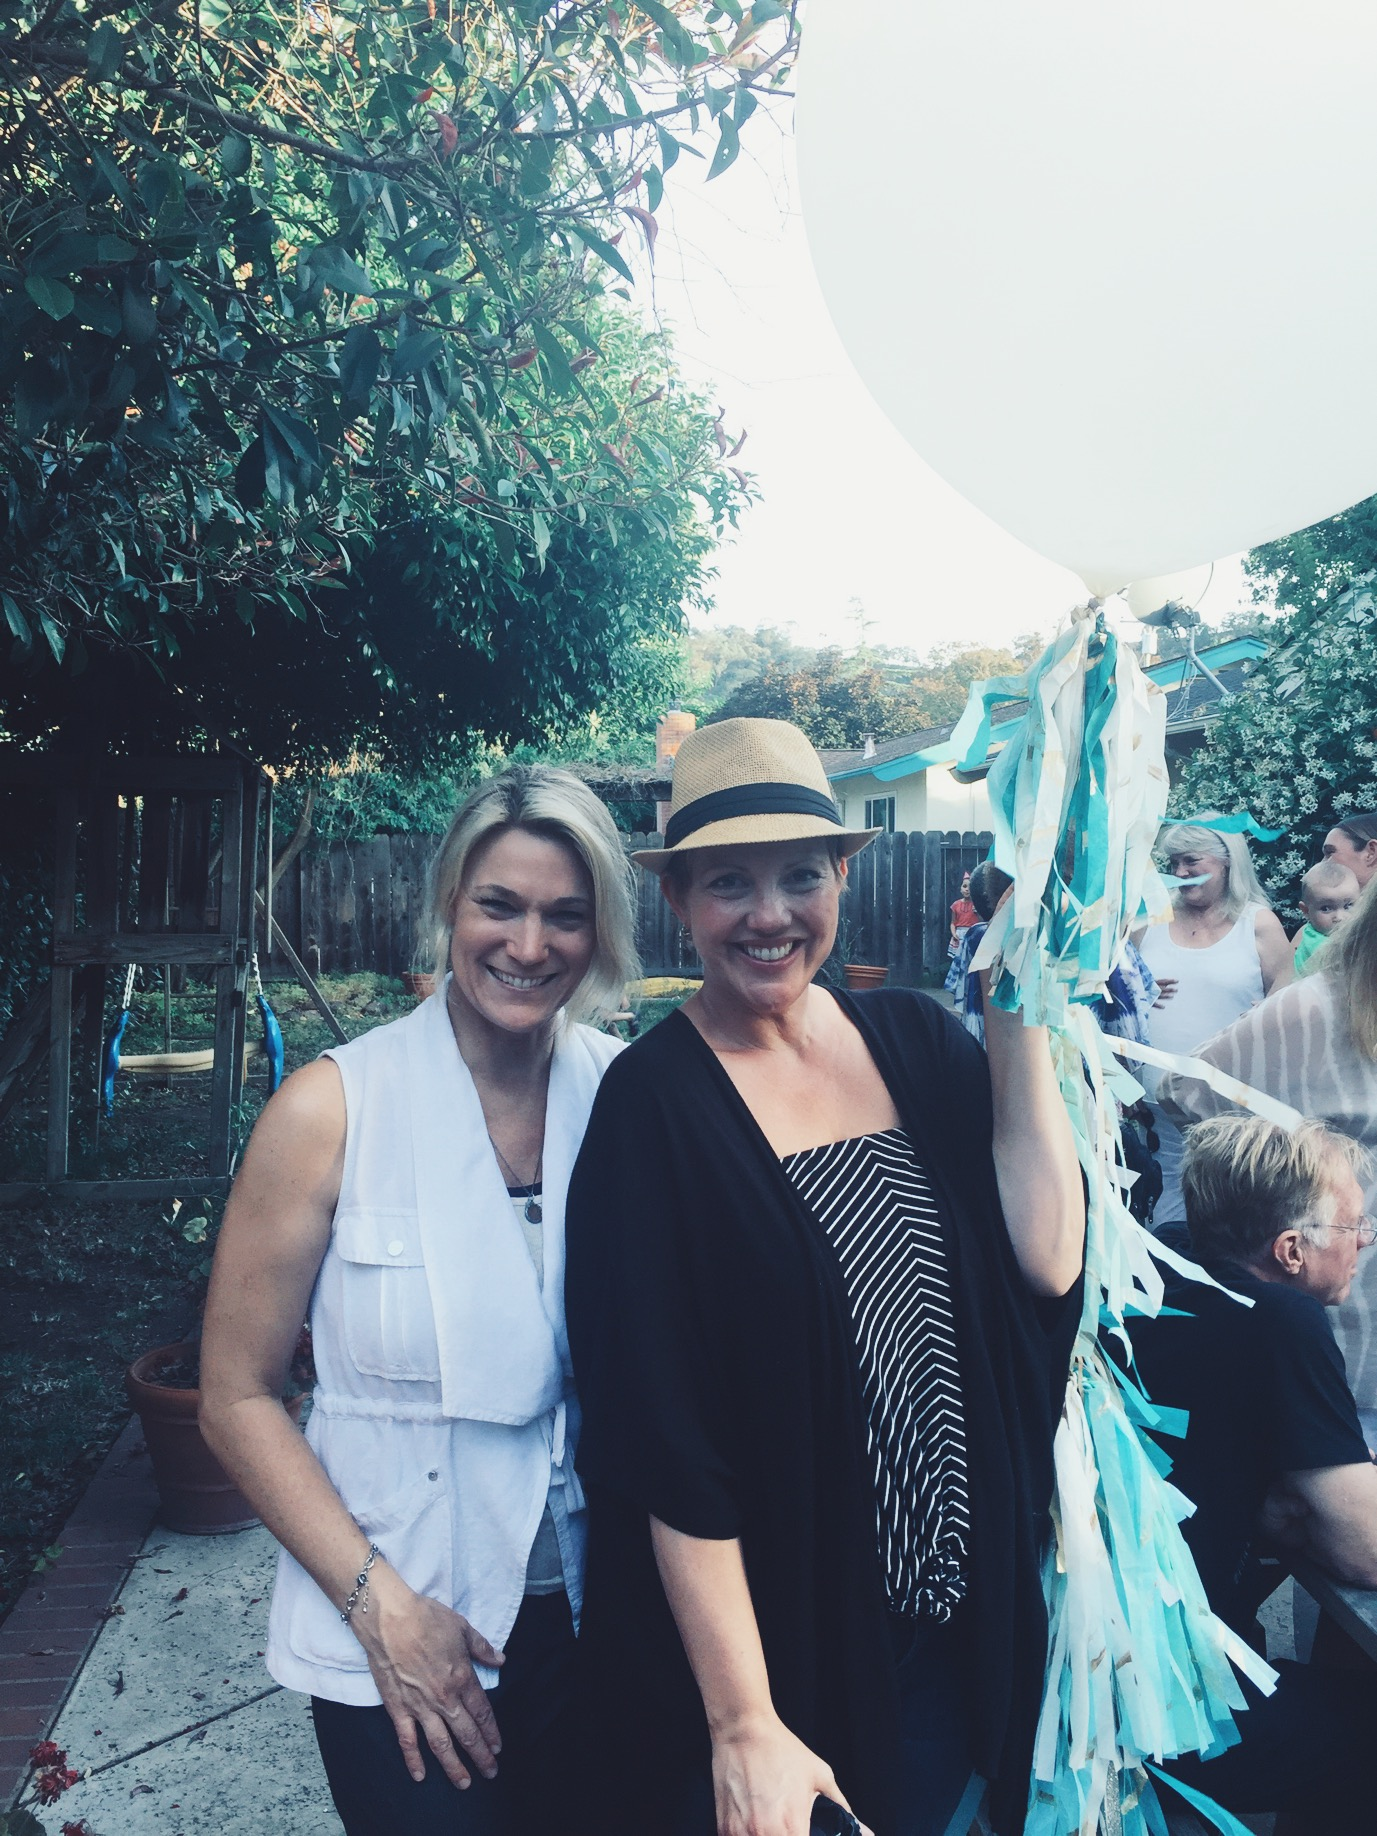 lifted-balloons-giant-balloons-white-icy-blue-matousek-art-celebration-walnutcreek-california